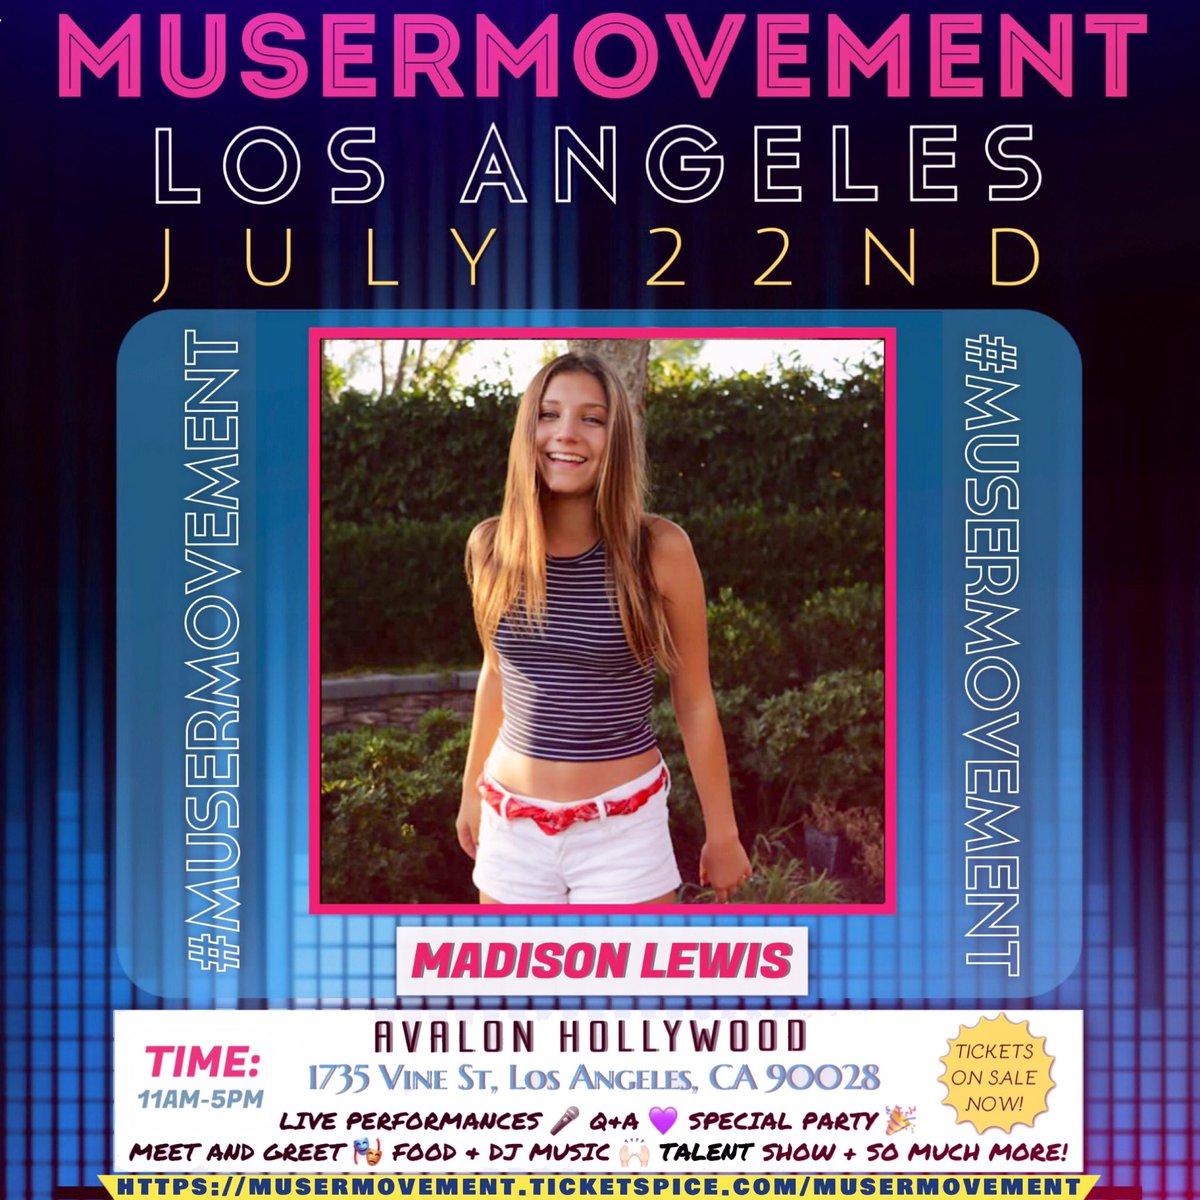 Mads lewis on twitter im hosting musermovement on july 22nd in mads lewis on twitter im hosting musermovement on july 22nd in la cant wait to meet you all m4hsunfo